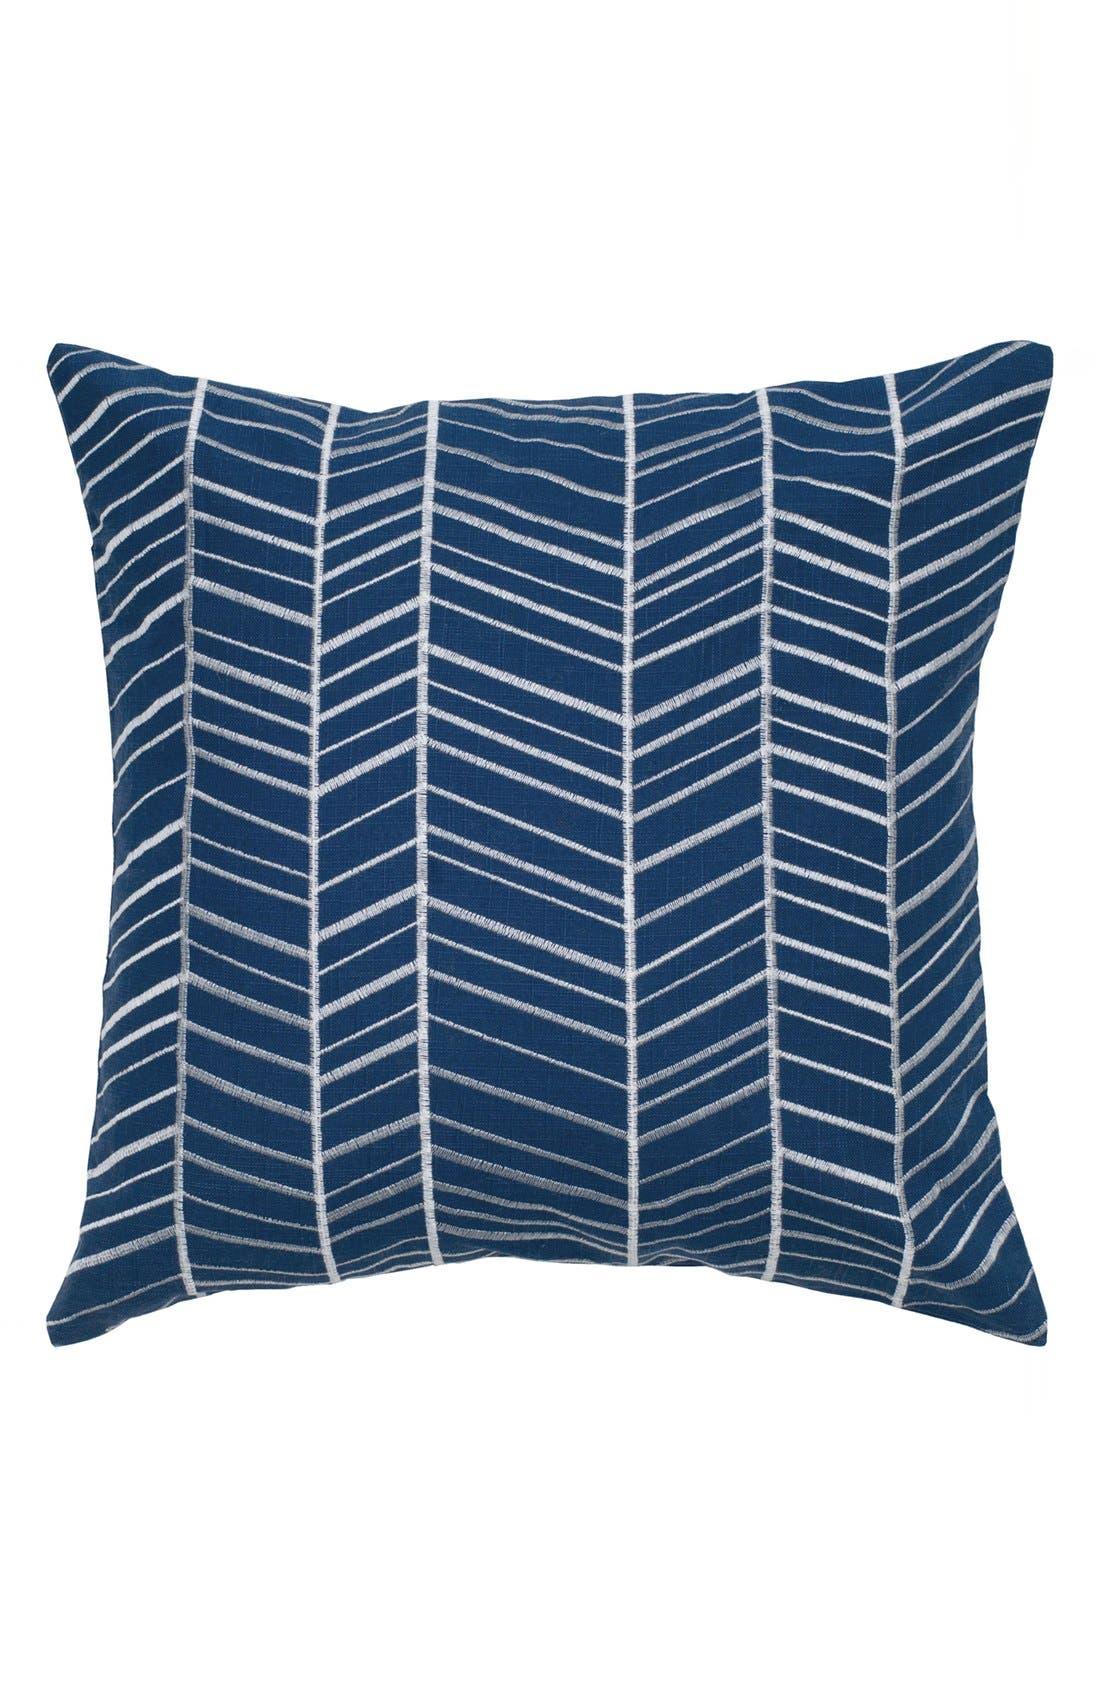 Chevron Pillow,                             Main thumbnail 1, color,                             Blue